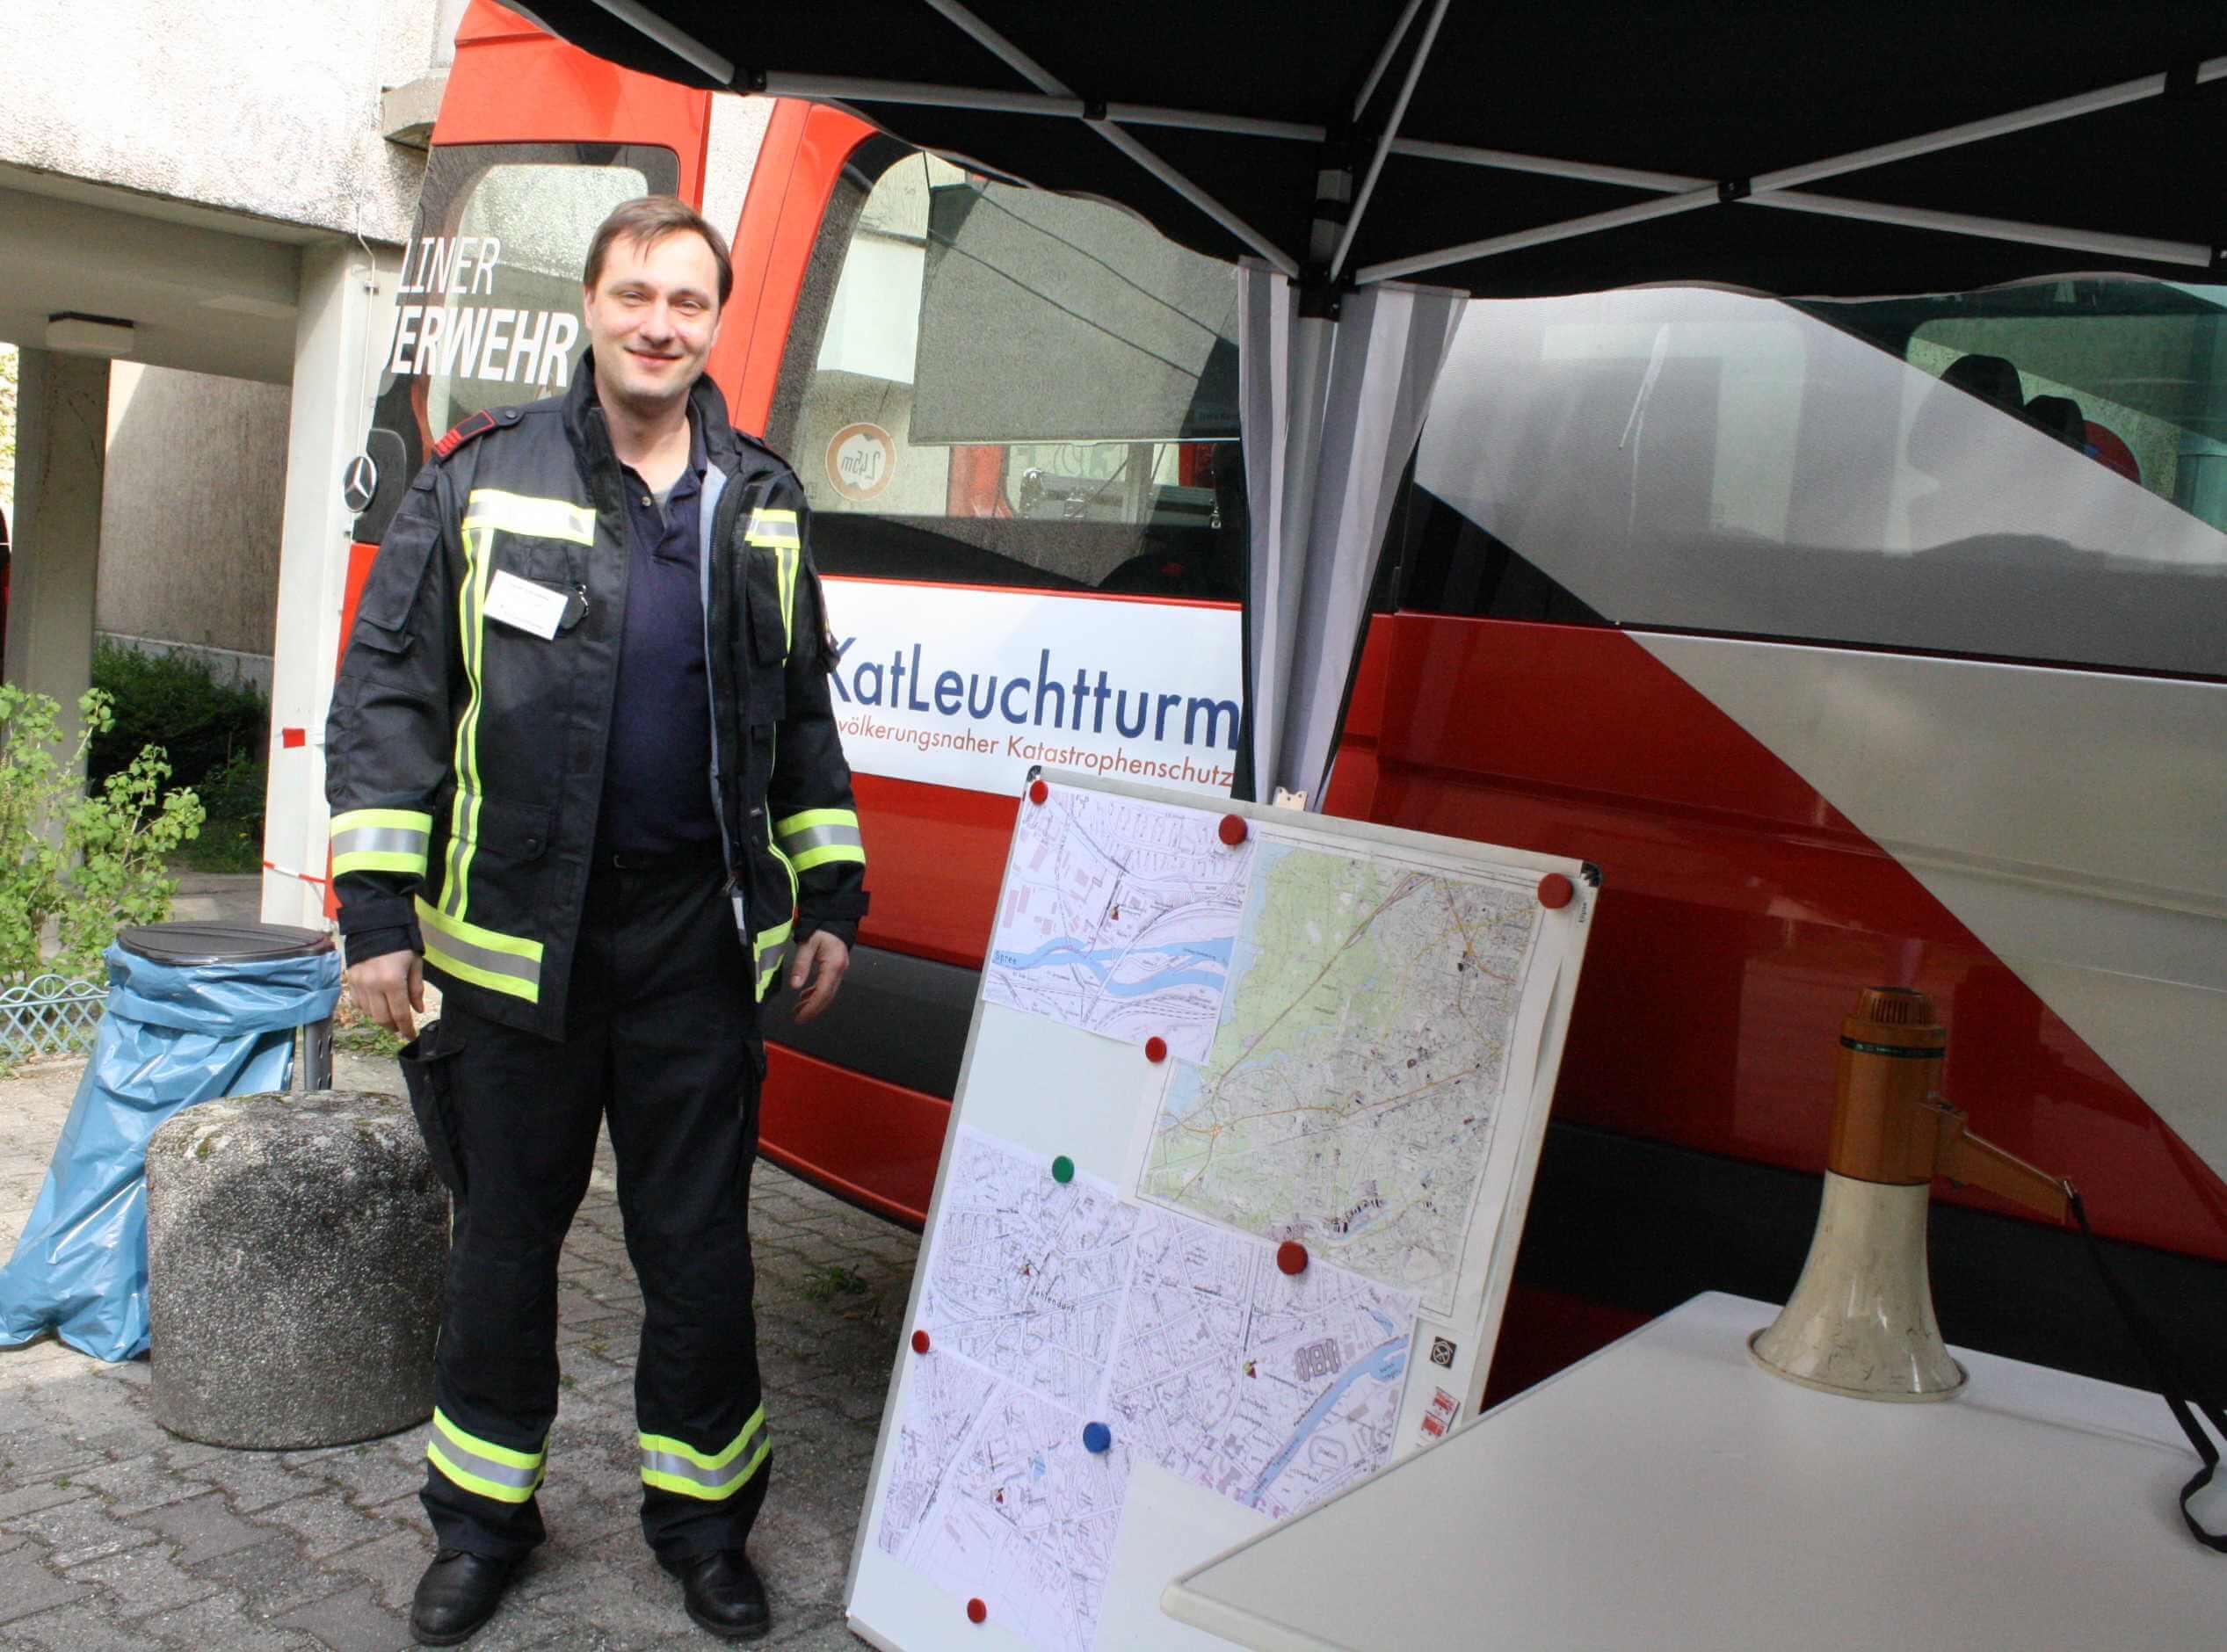 Blackout in Berlin: Forschungsprojekt KatLeuchttürme probt in Zehlendorf für den Ernstfall